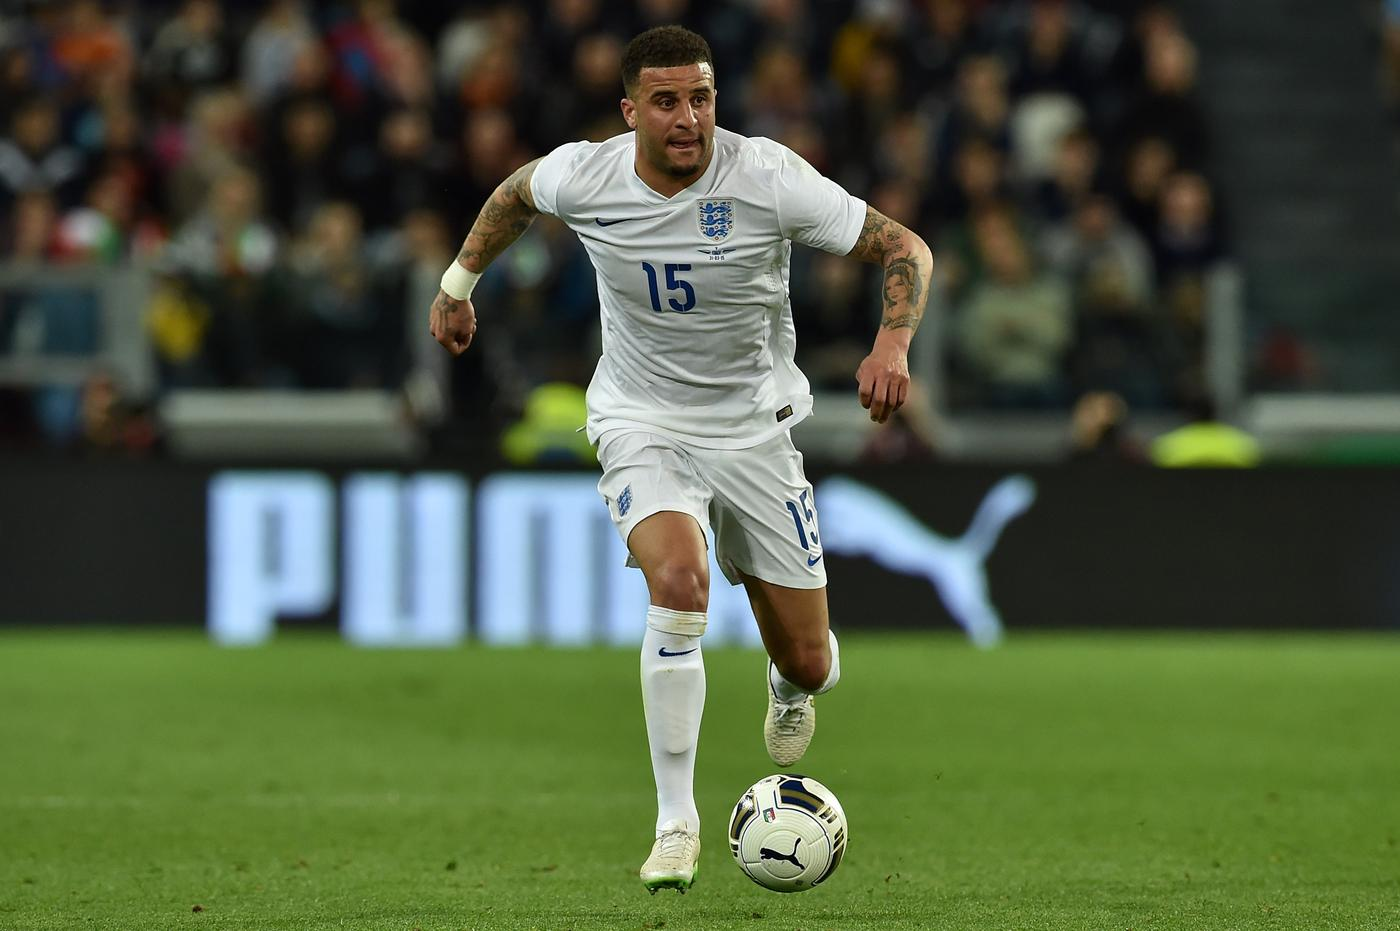 Tottenham Hotspur 'will consider transfer offers for Kyle Walker, putting Manchester United on alert'